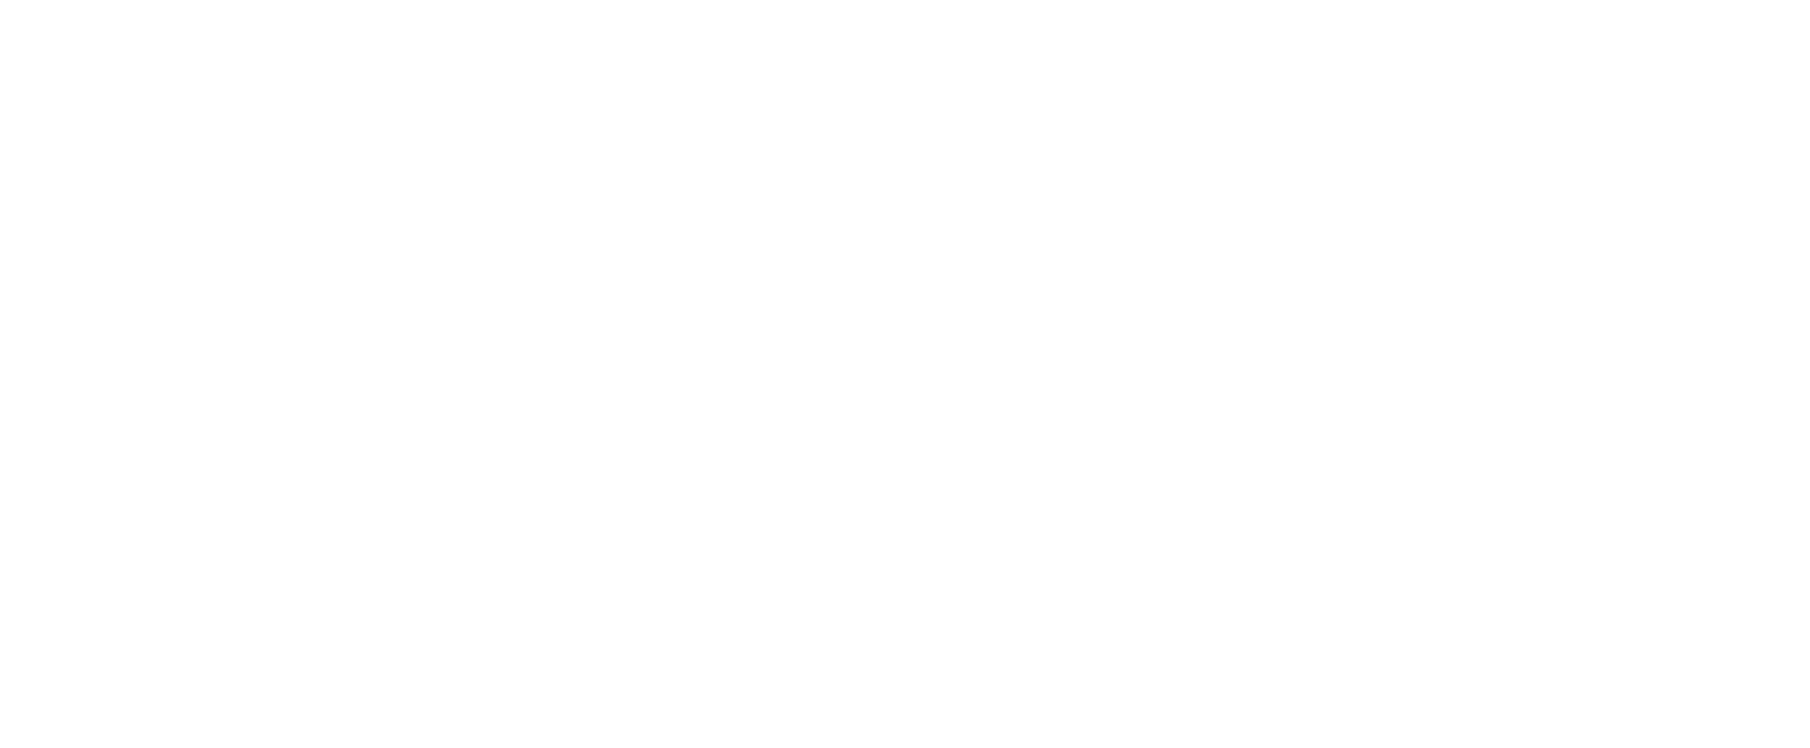 Town of Vernon